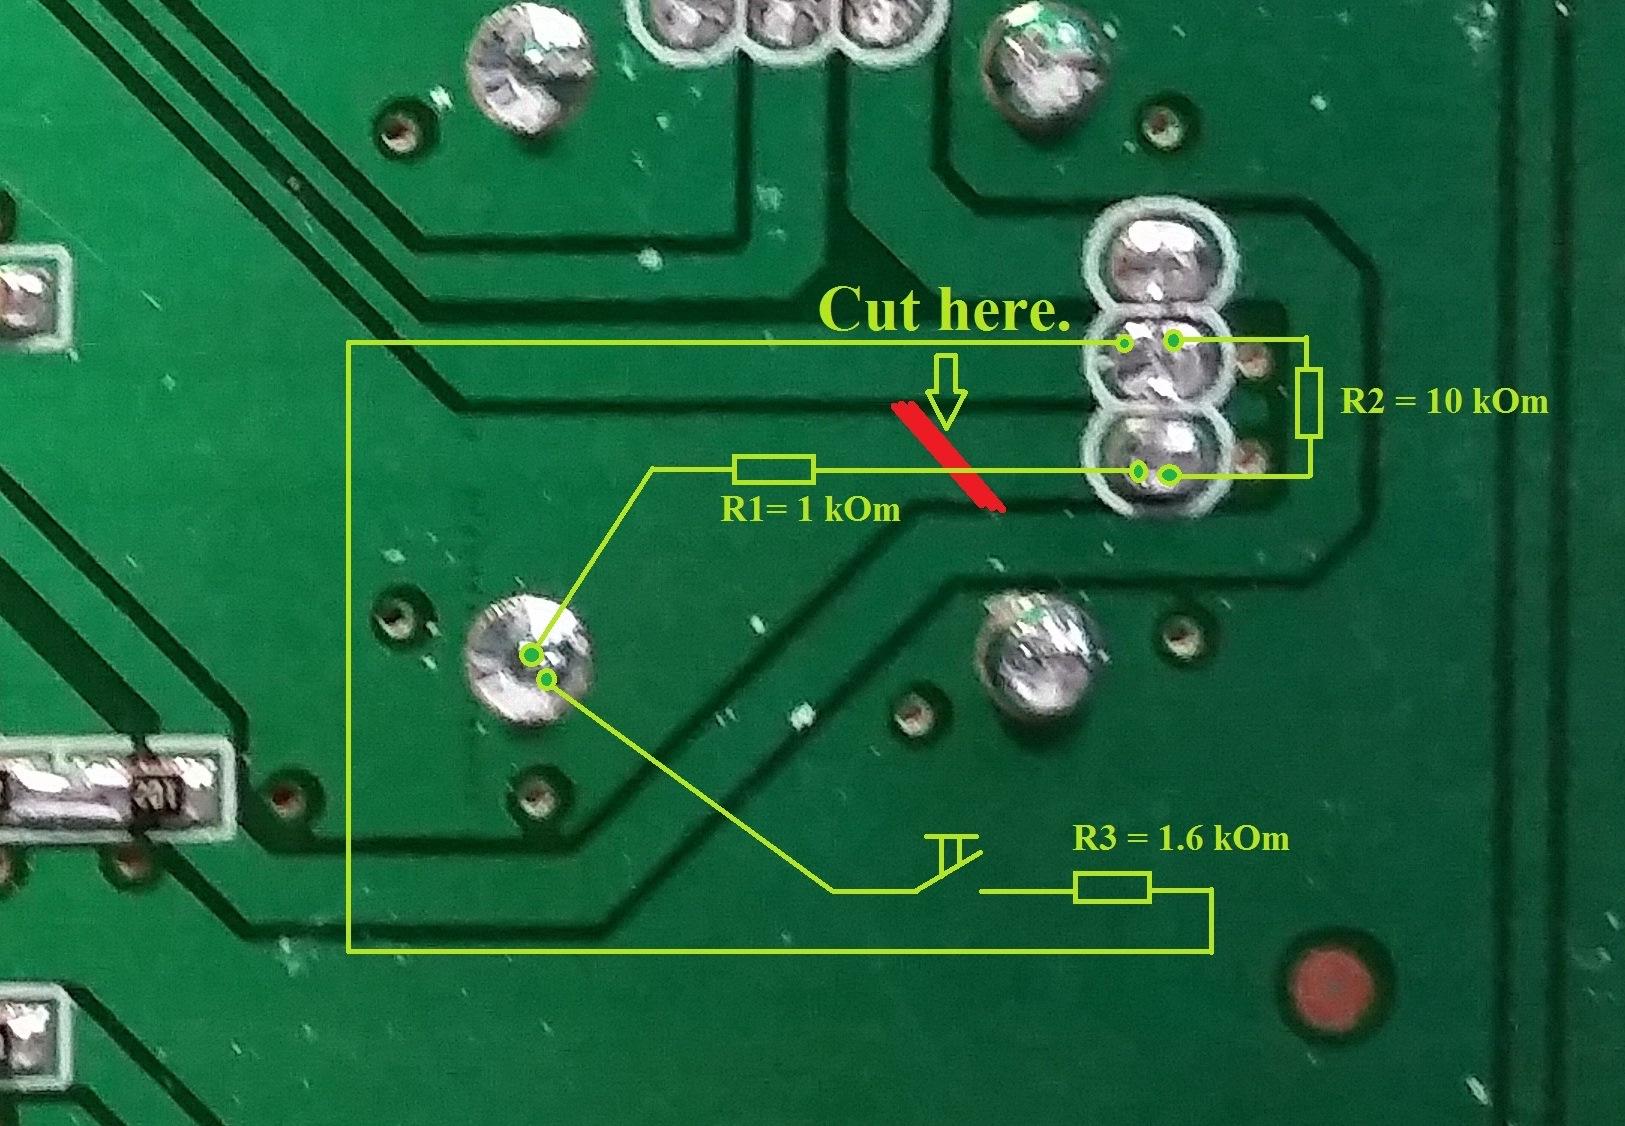 Syma X8 problema radiocomando - Leva Motori